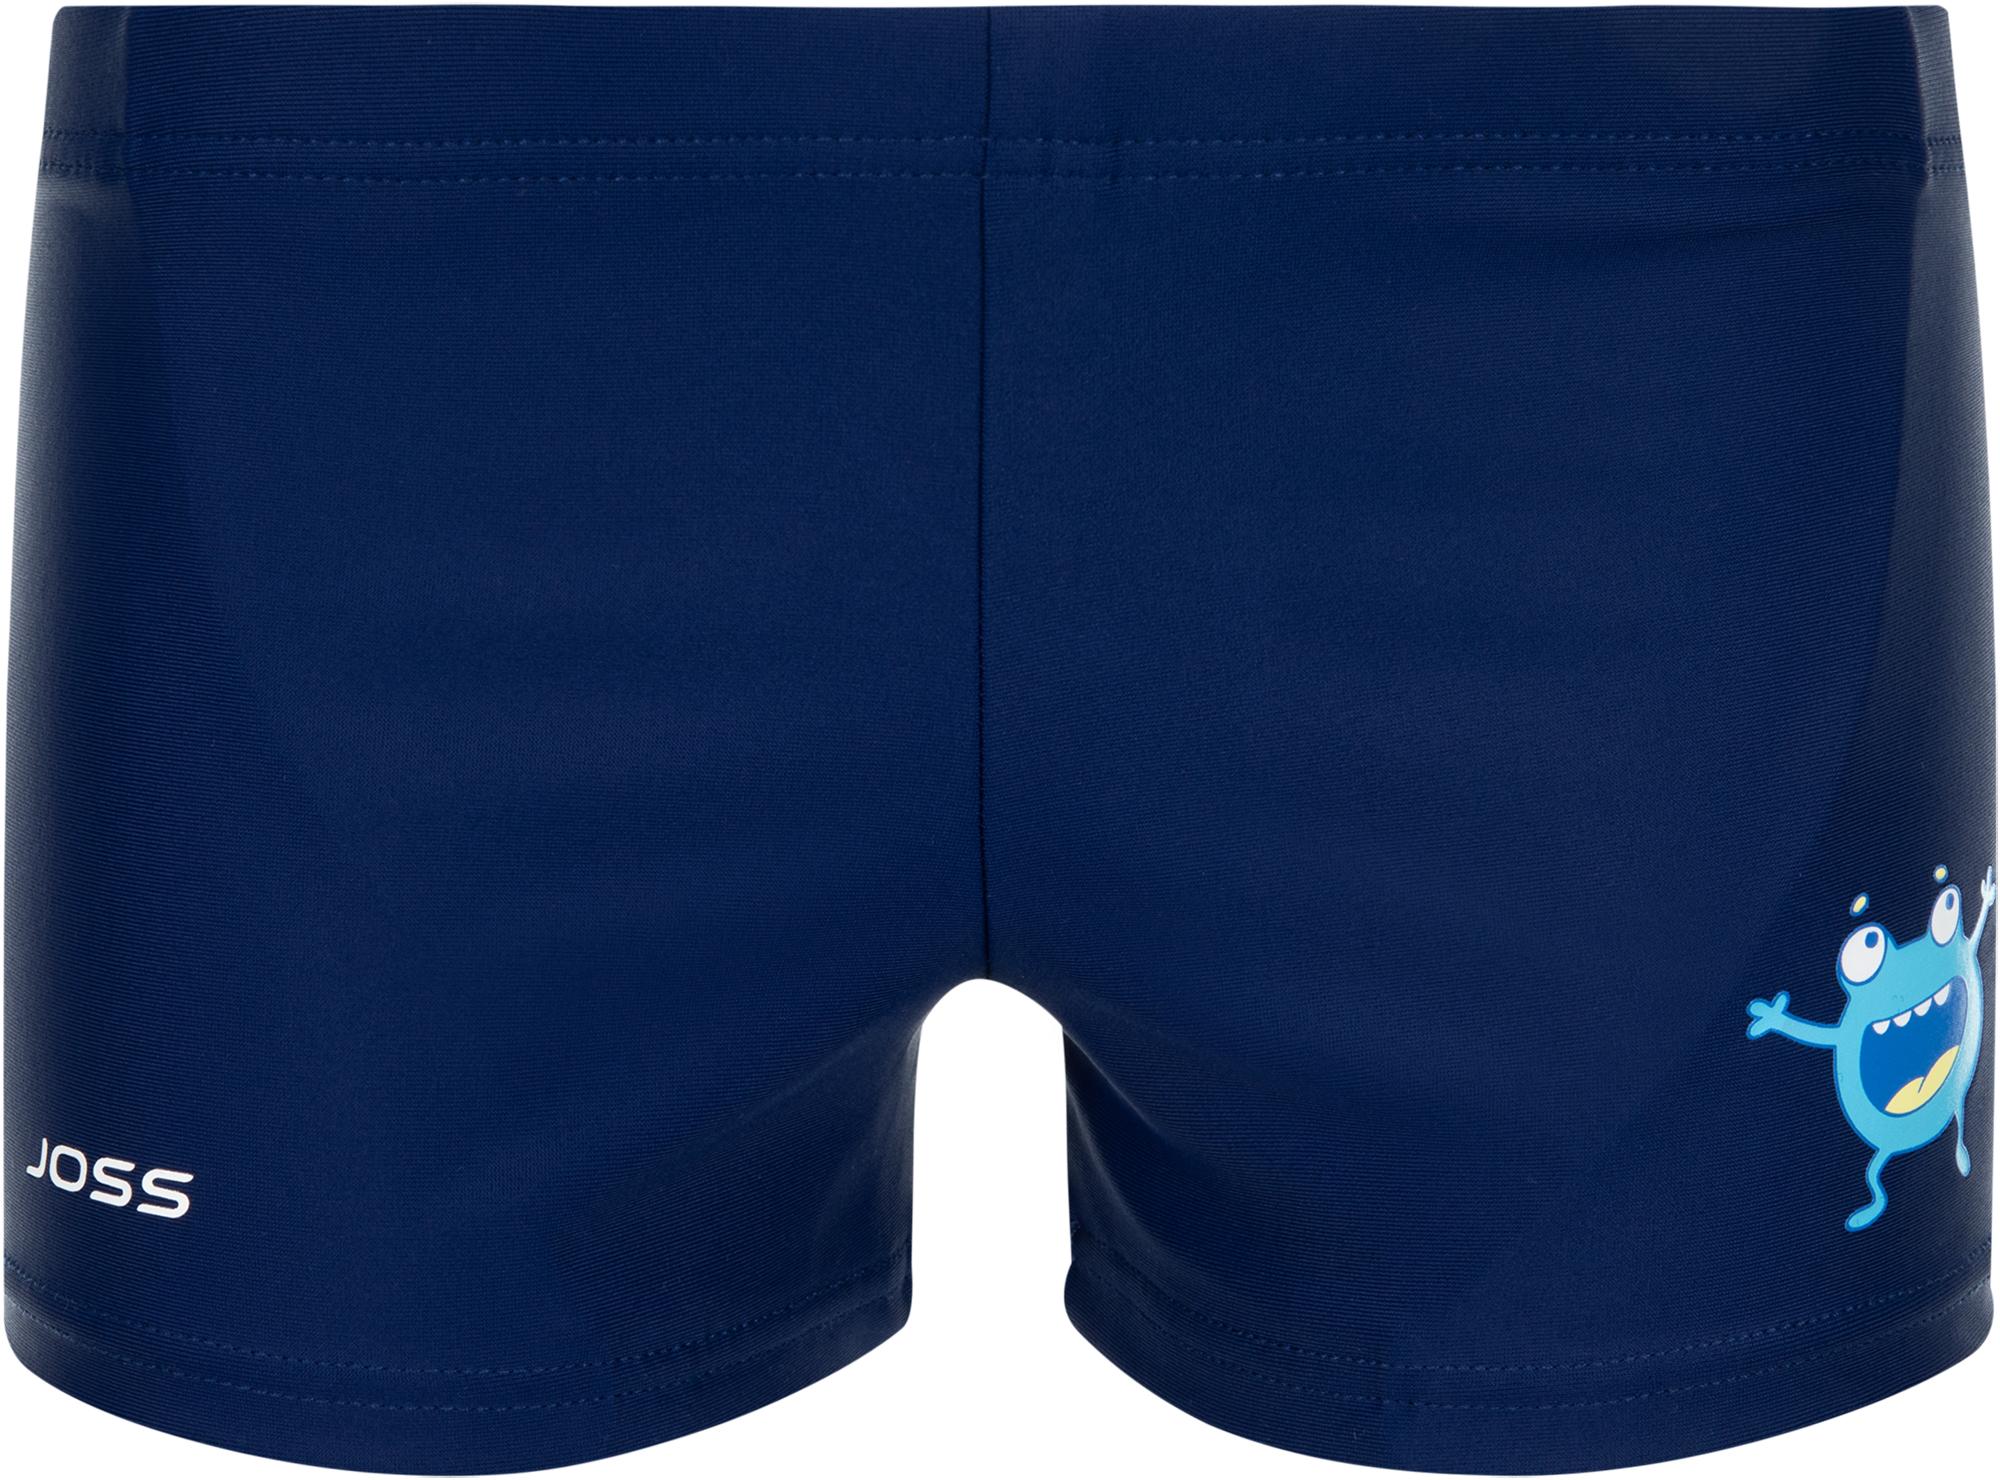 Joss Плавки-шорты для мальчиков Joss, размер 122